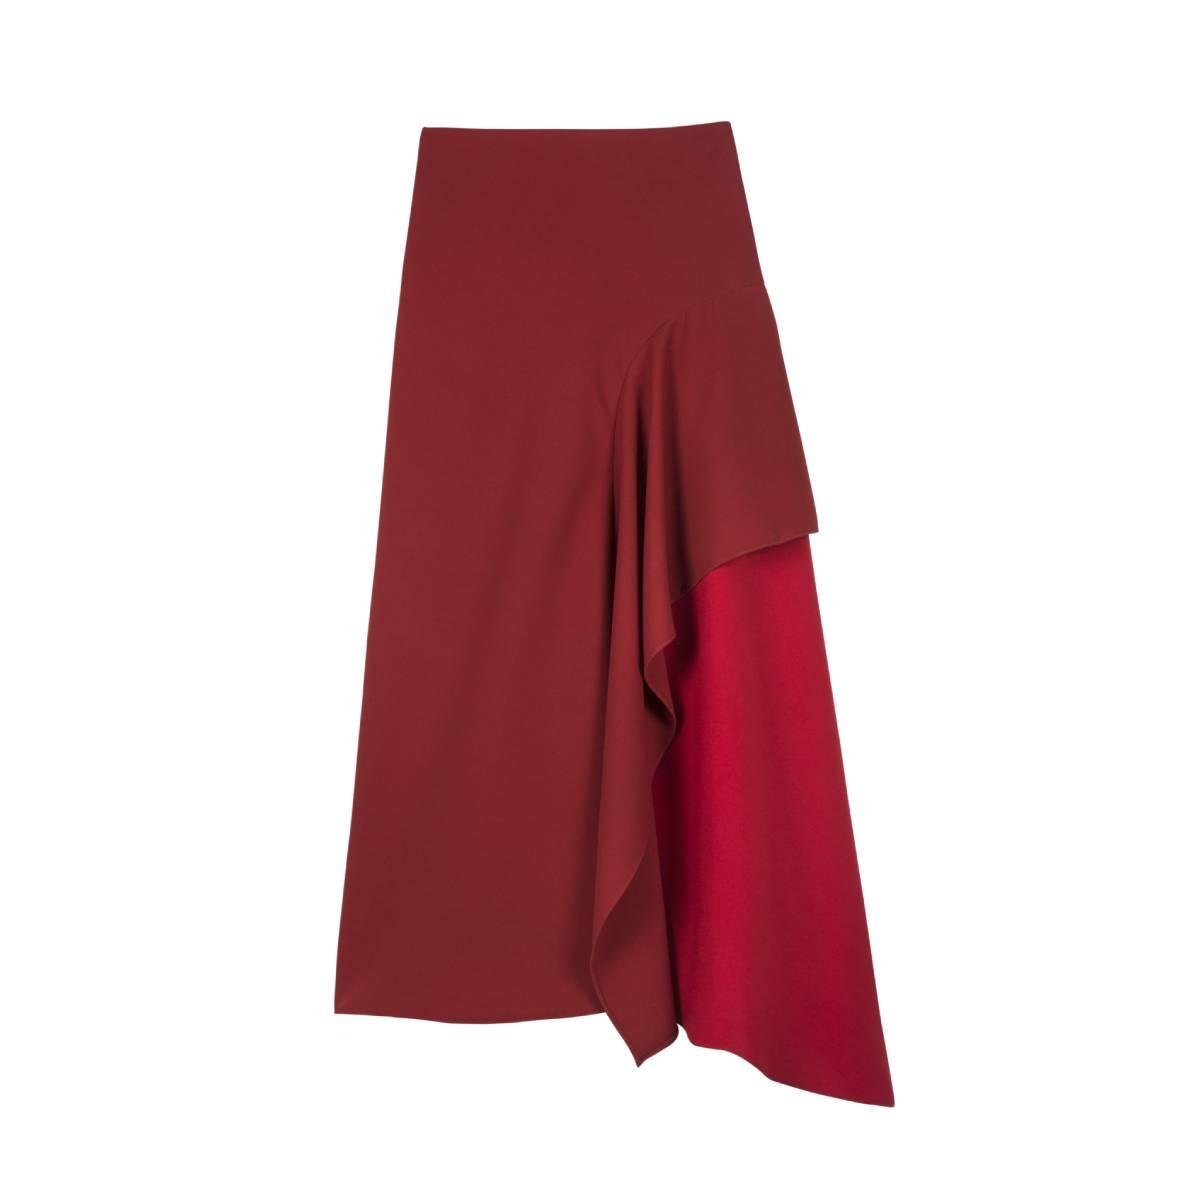 Alejandra de coss women´s asymmetric red skirt